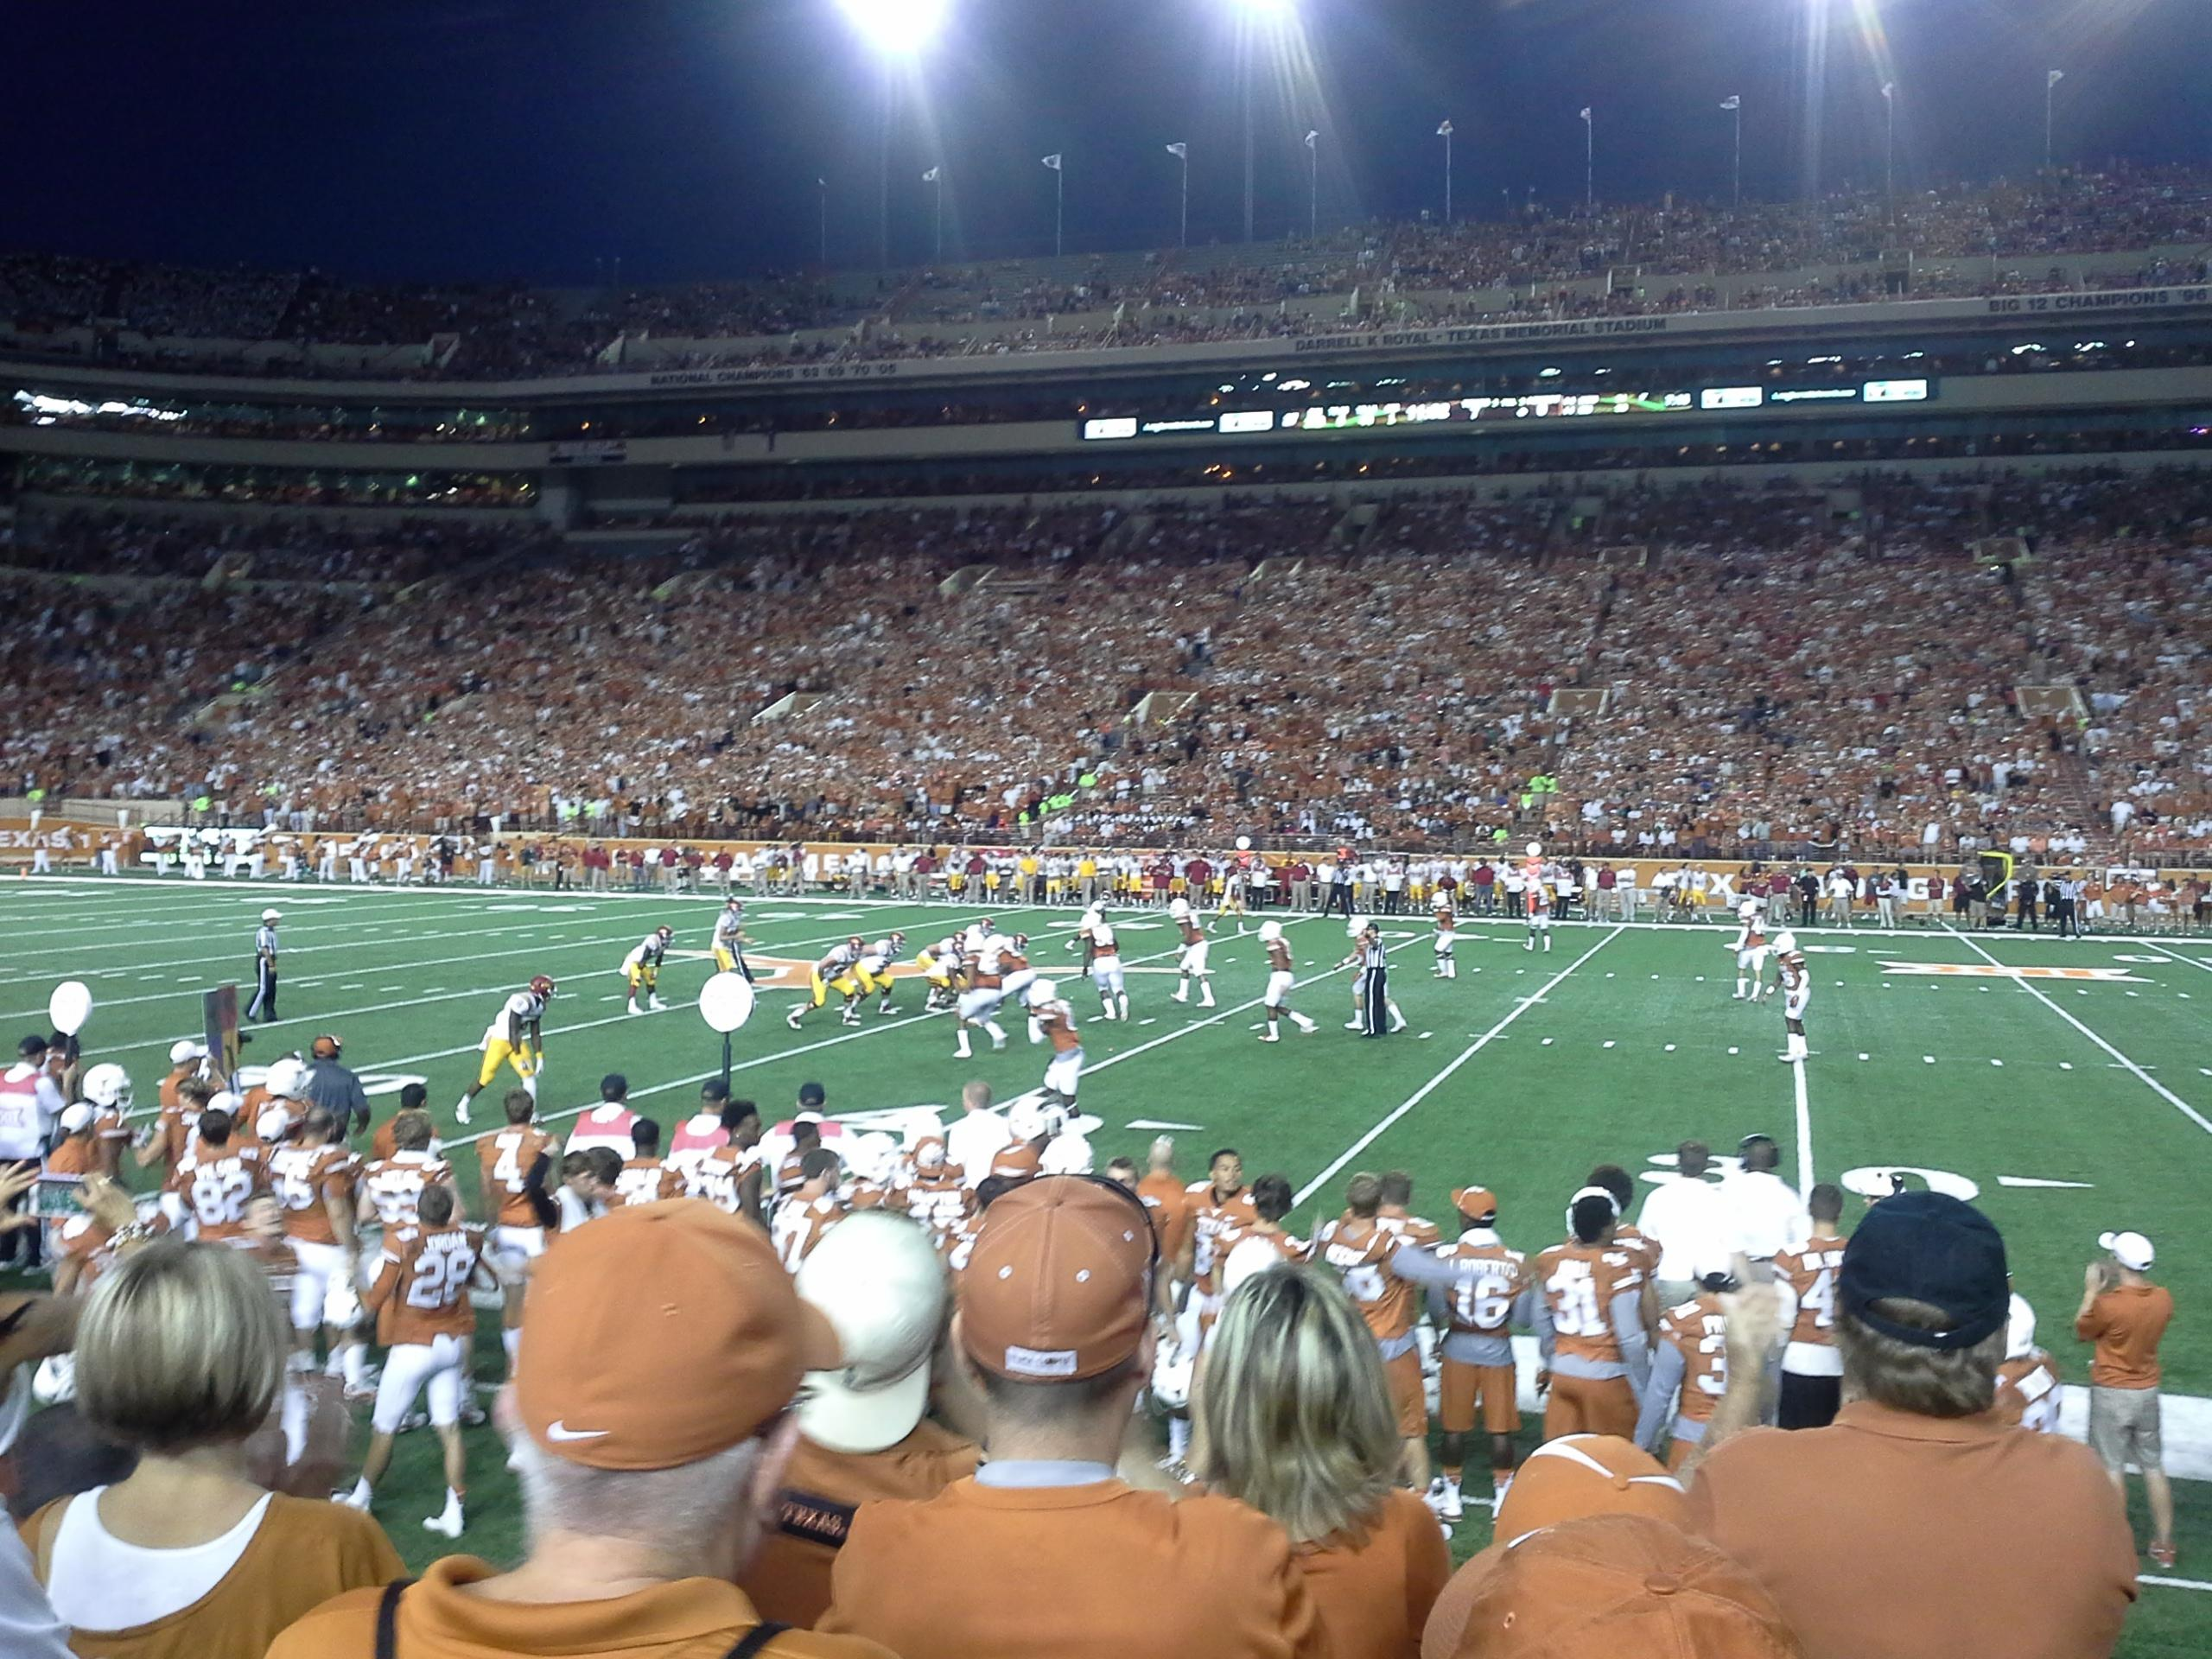 Texas Memorial Stadium Section 4 Row 5